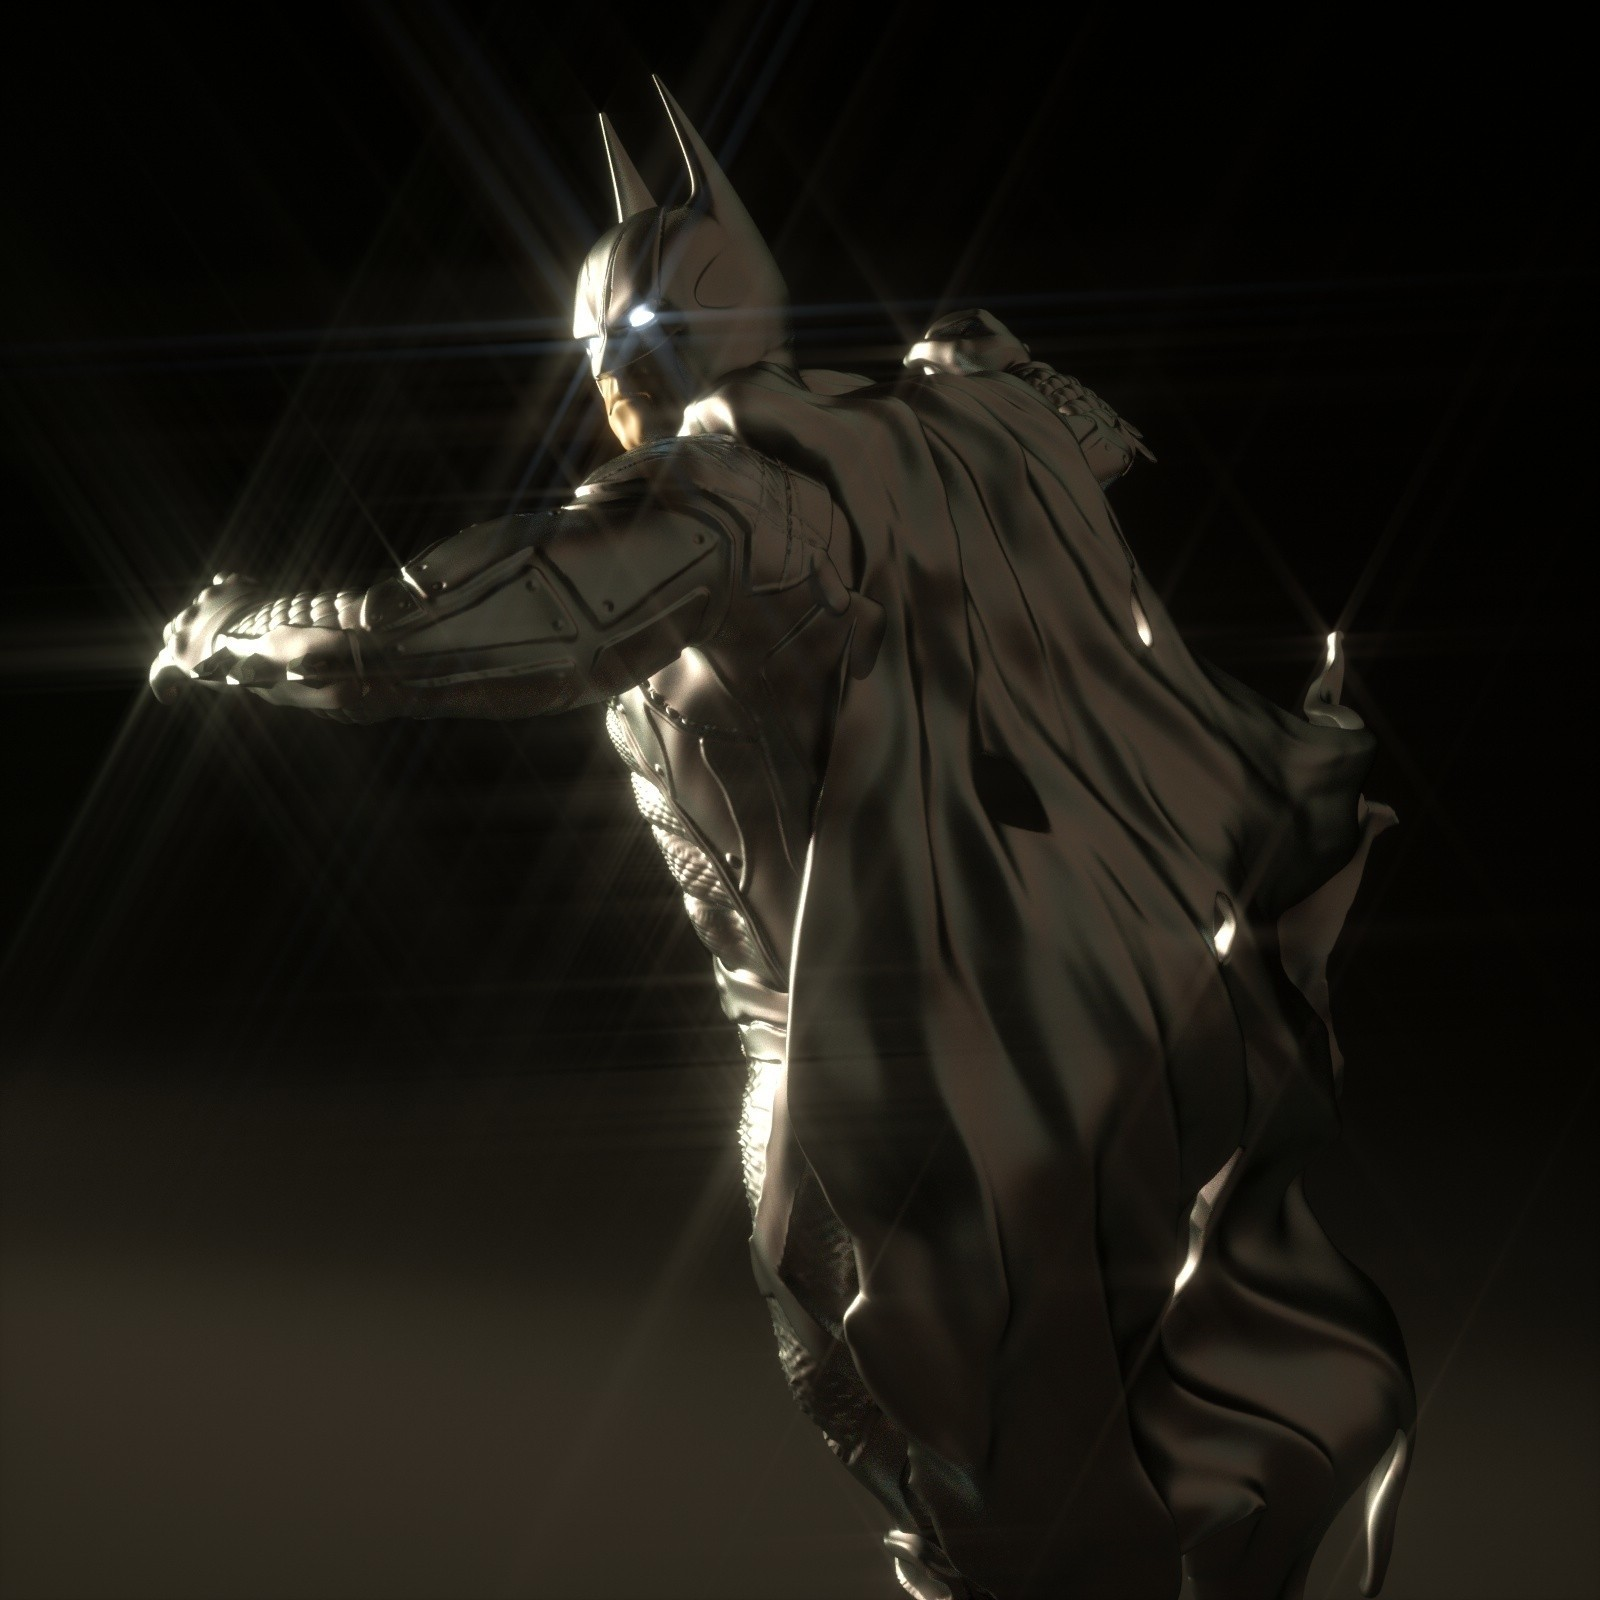 15.jpg Download OBJ file BATMAN Battle Pose • 3D print template, tolgaaxu